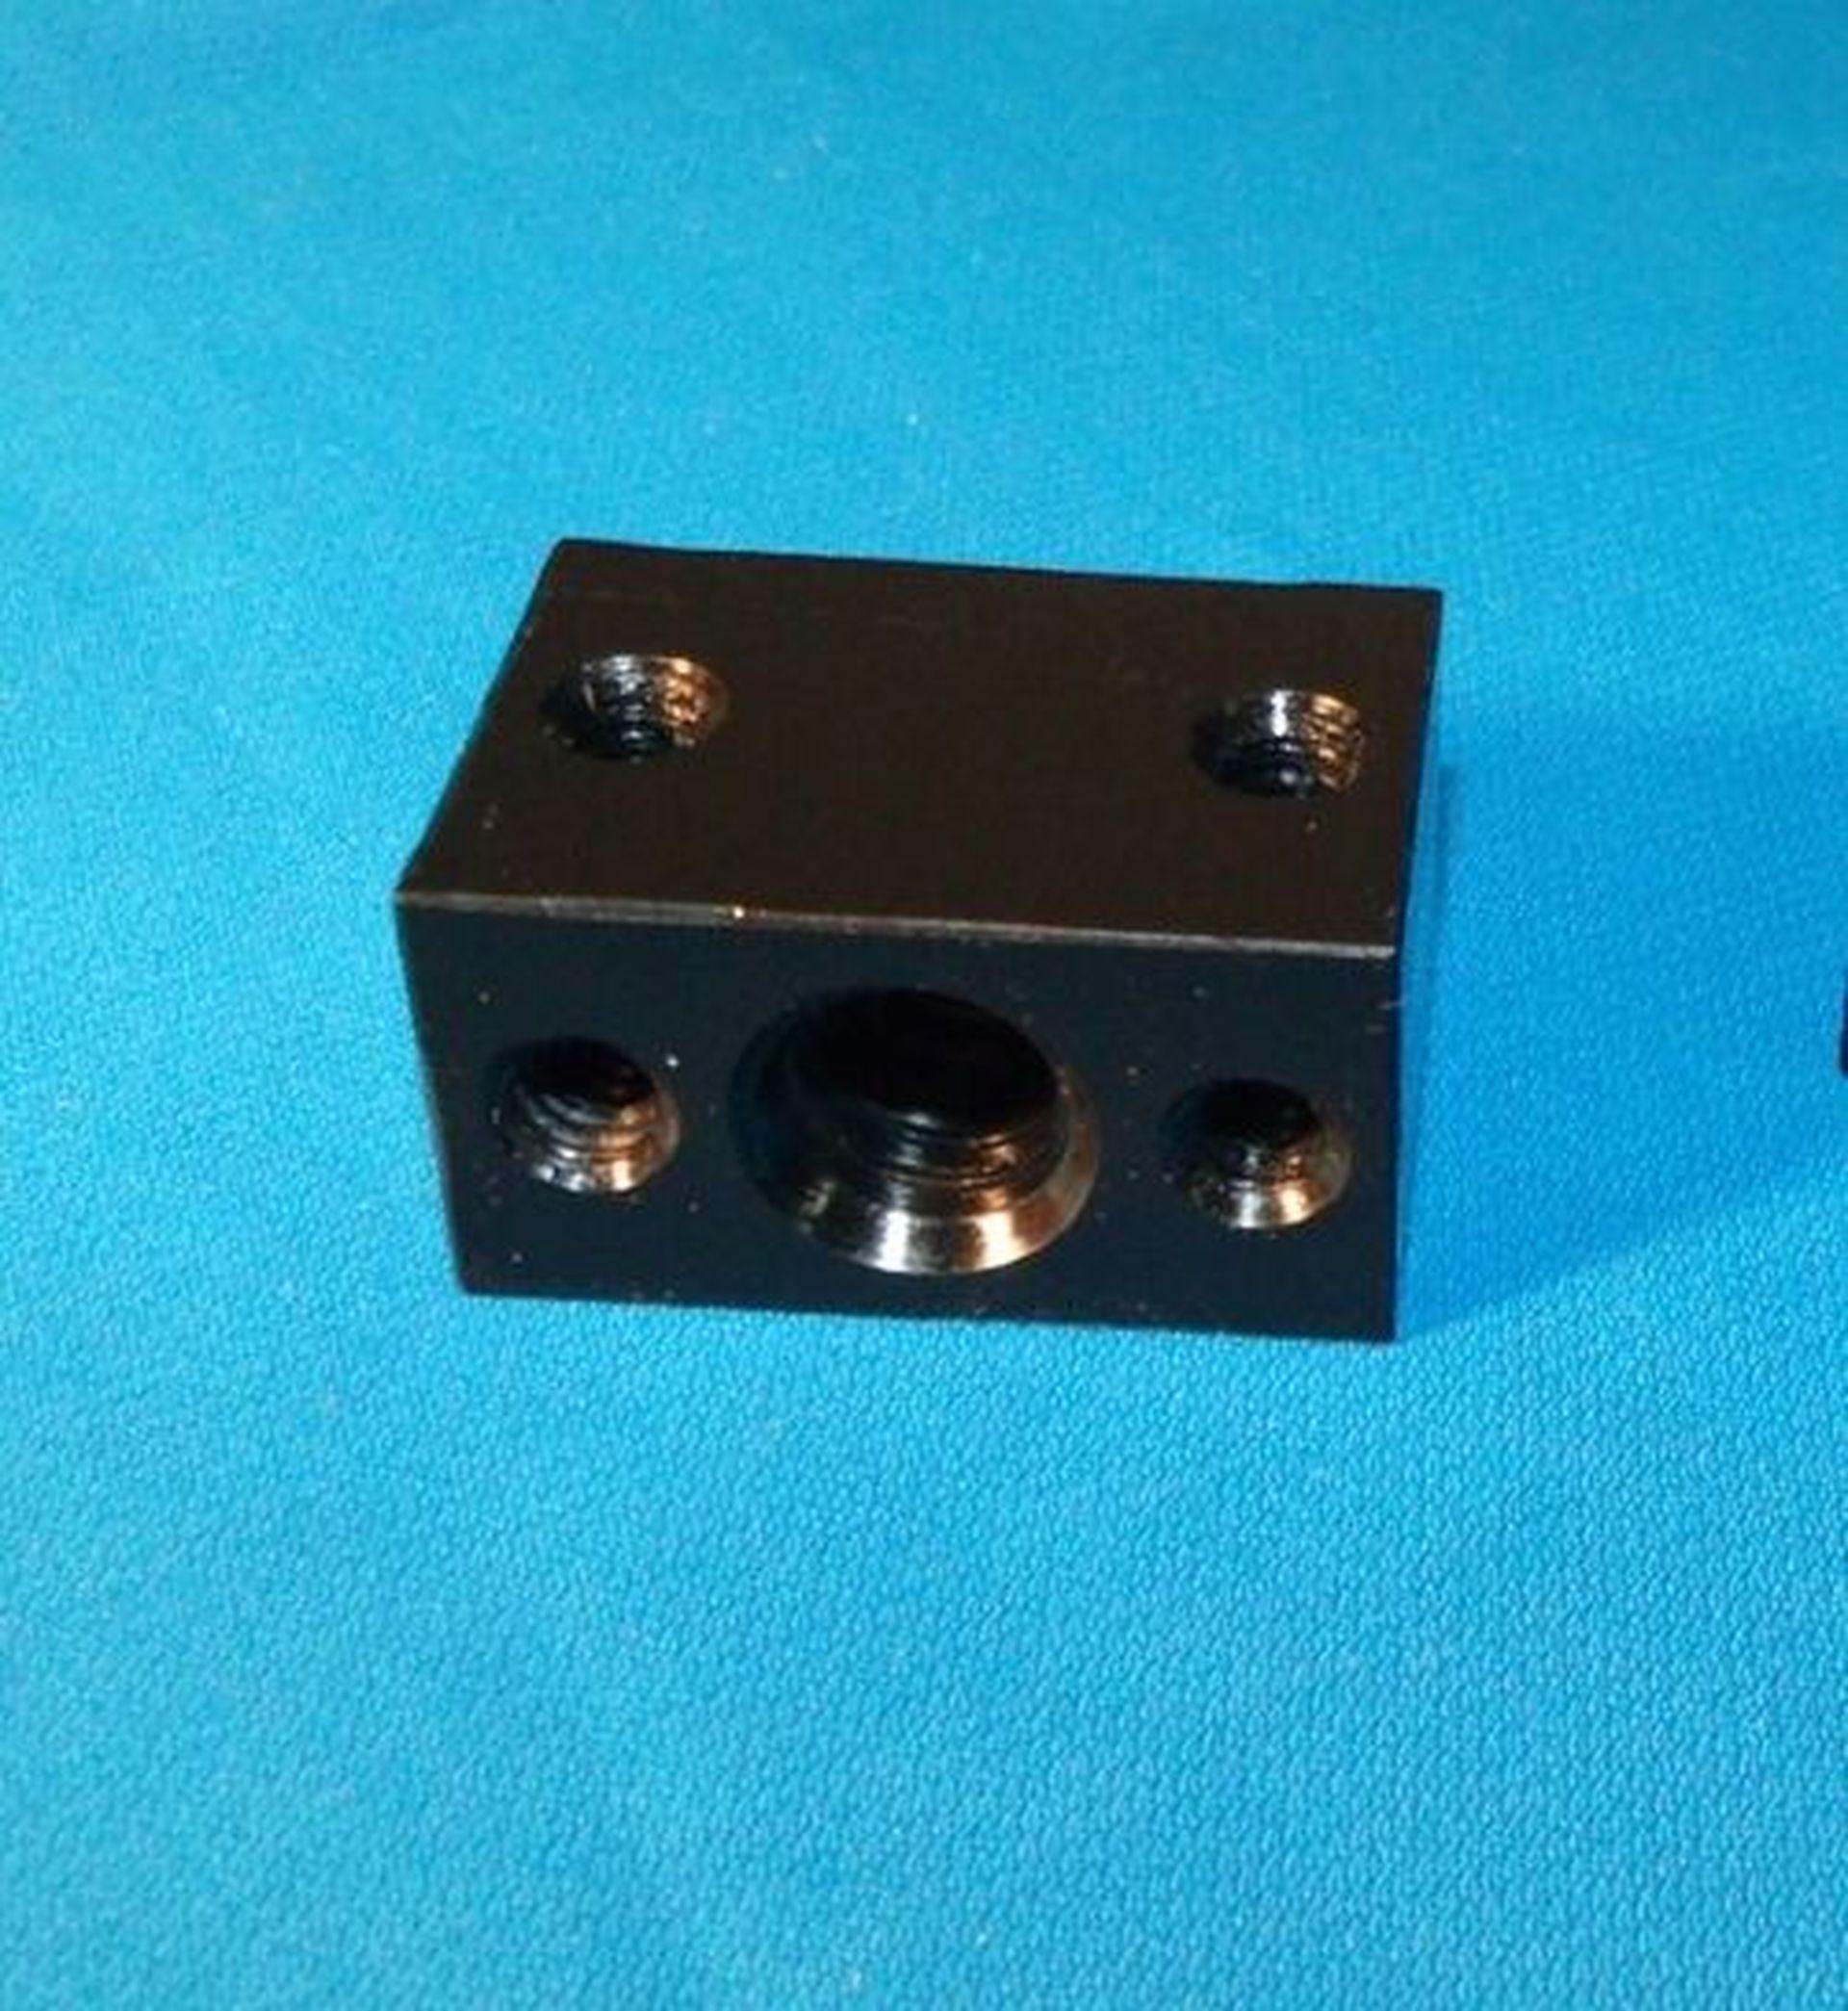 1 2 10 Acme Delrin Nut Block Rh For Acme Threaded Rod 5 Start Cnc 3d Printer Acme Thread 3d Printer Printer